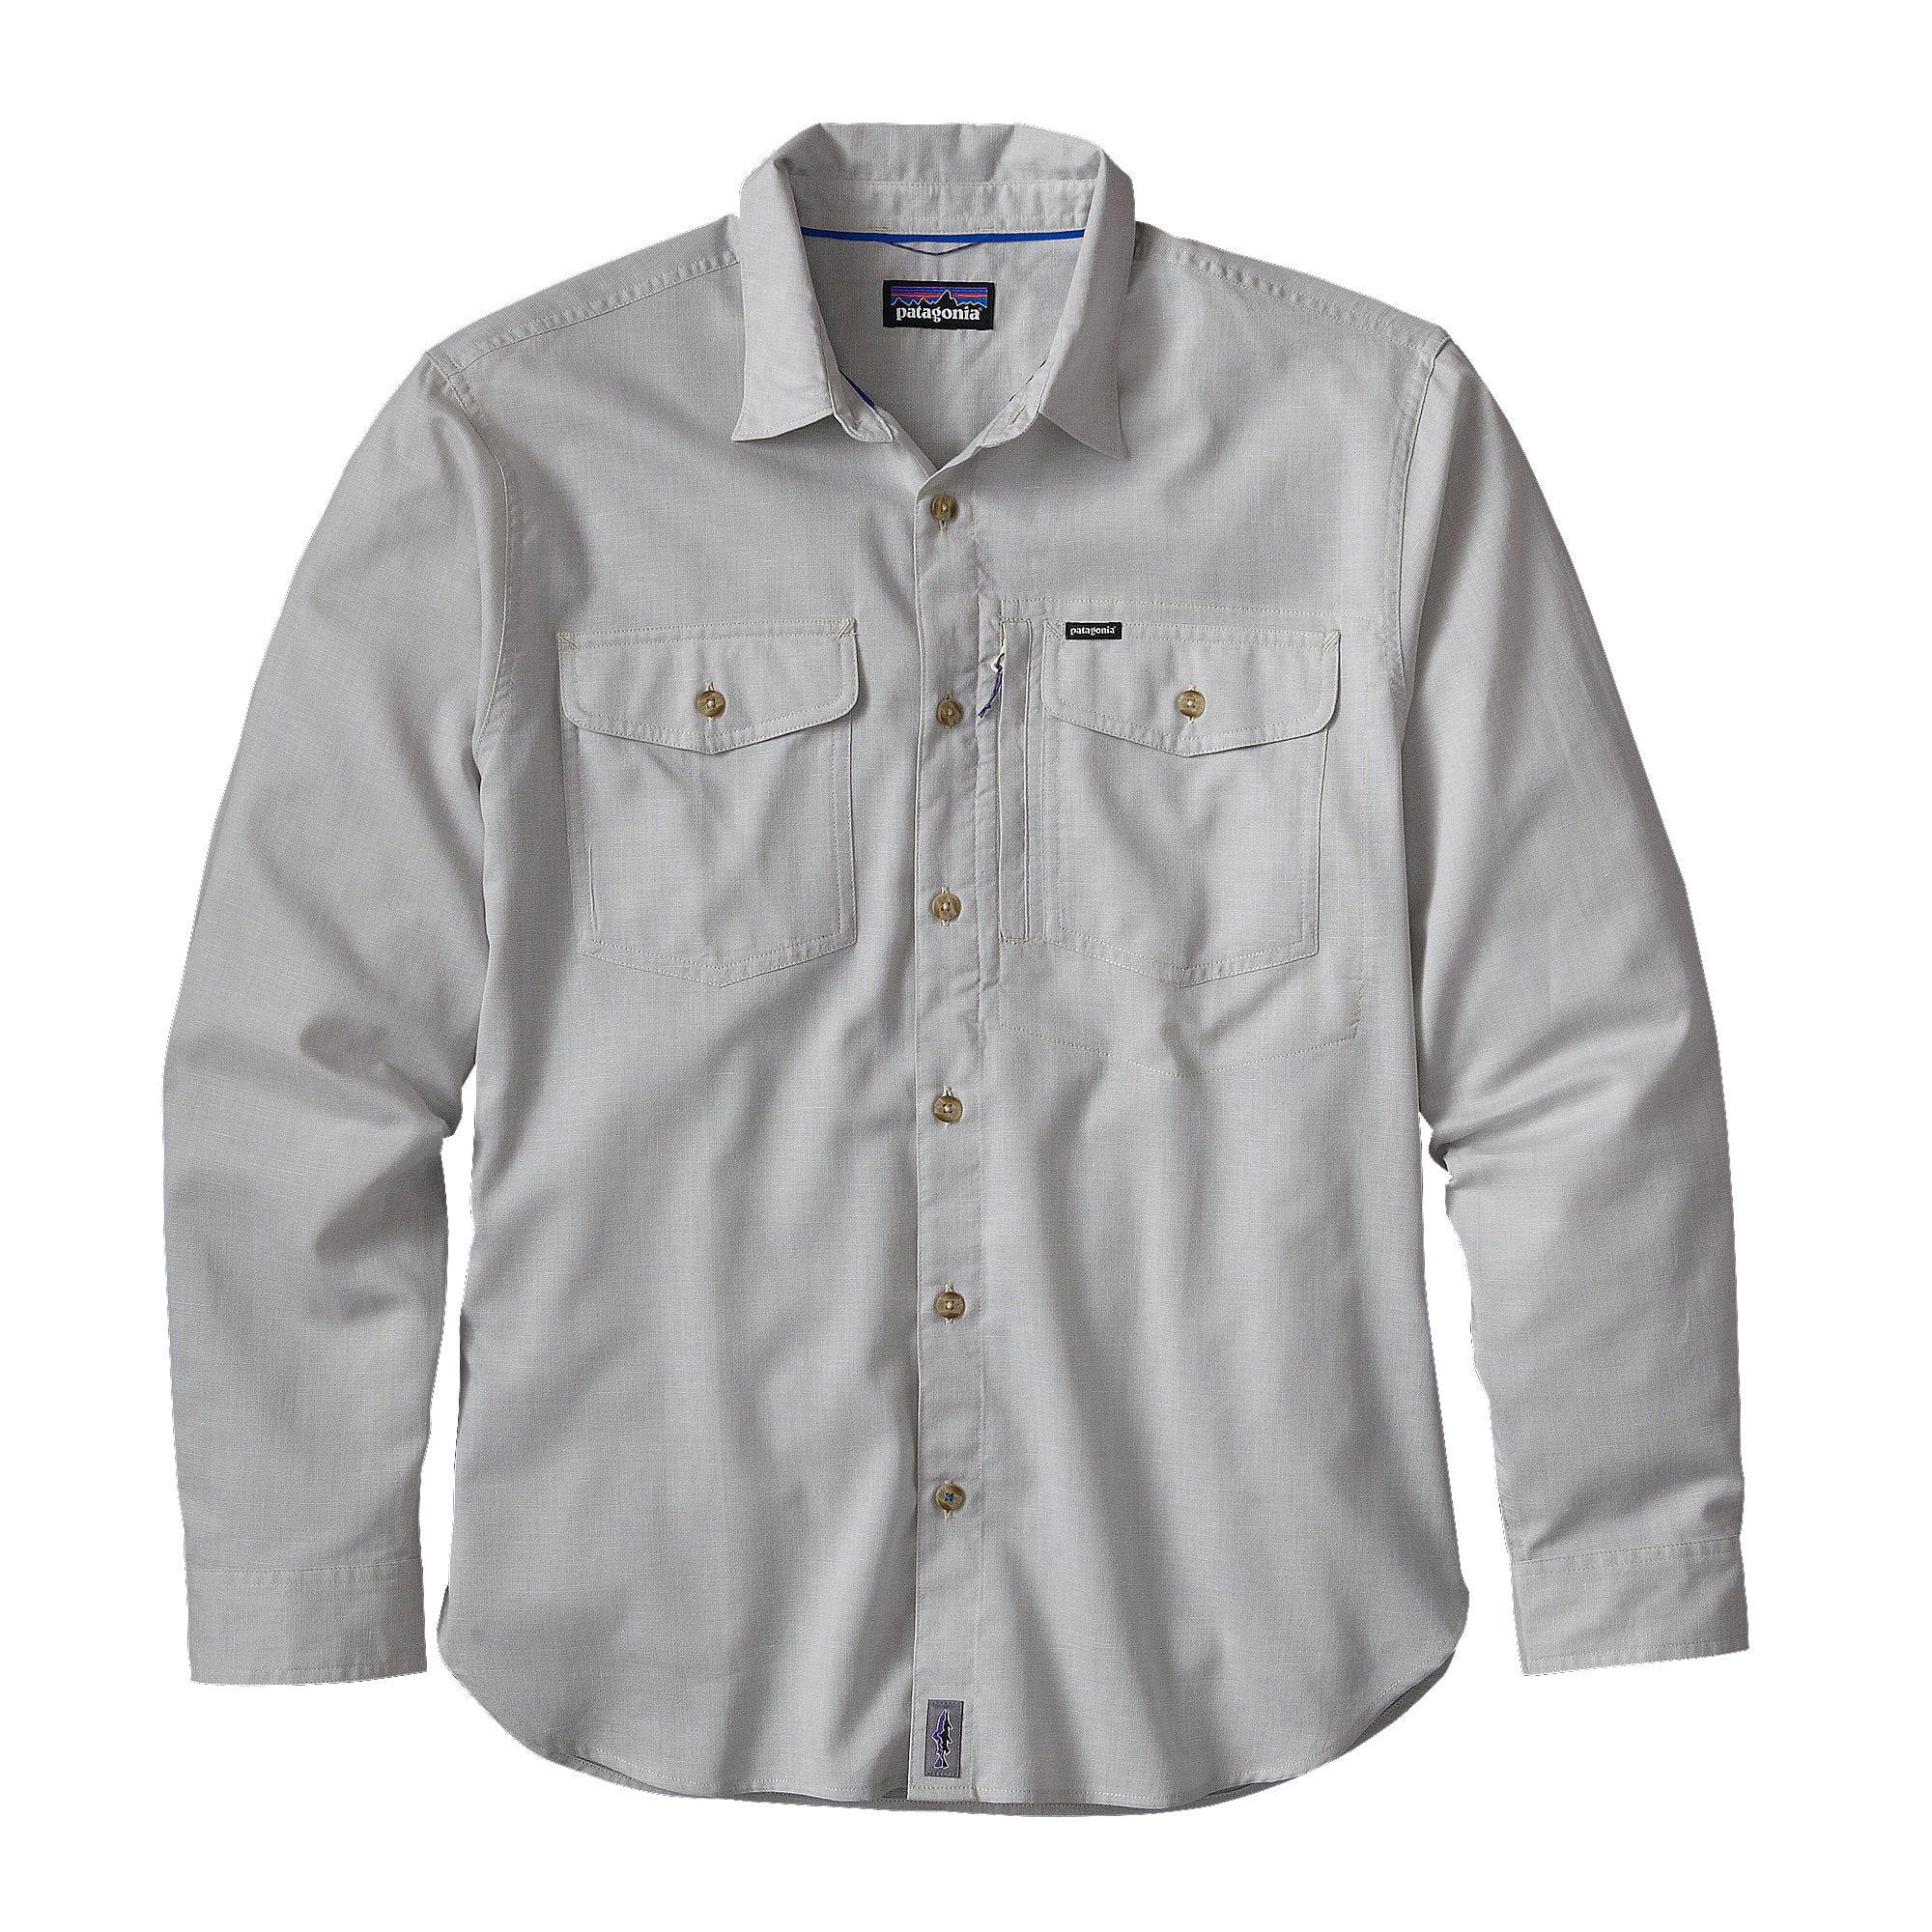 Patagonia Mens Cayo Largo Shirt Drifter Grey